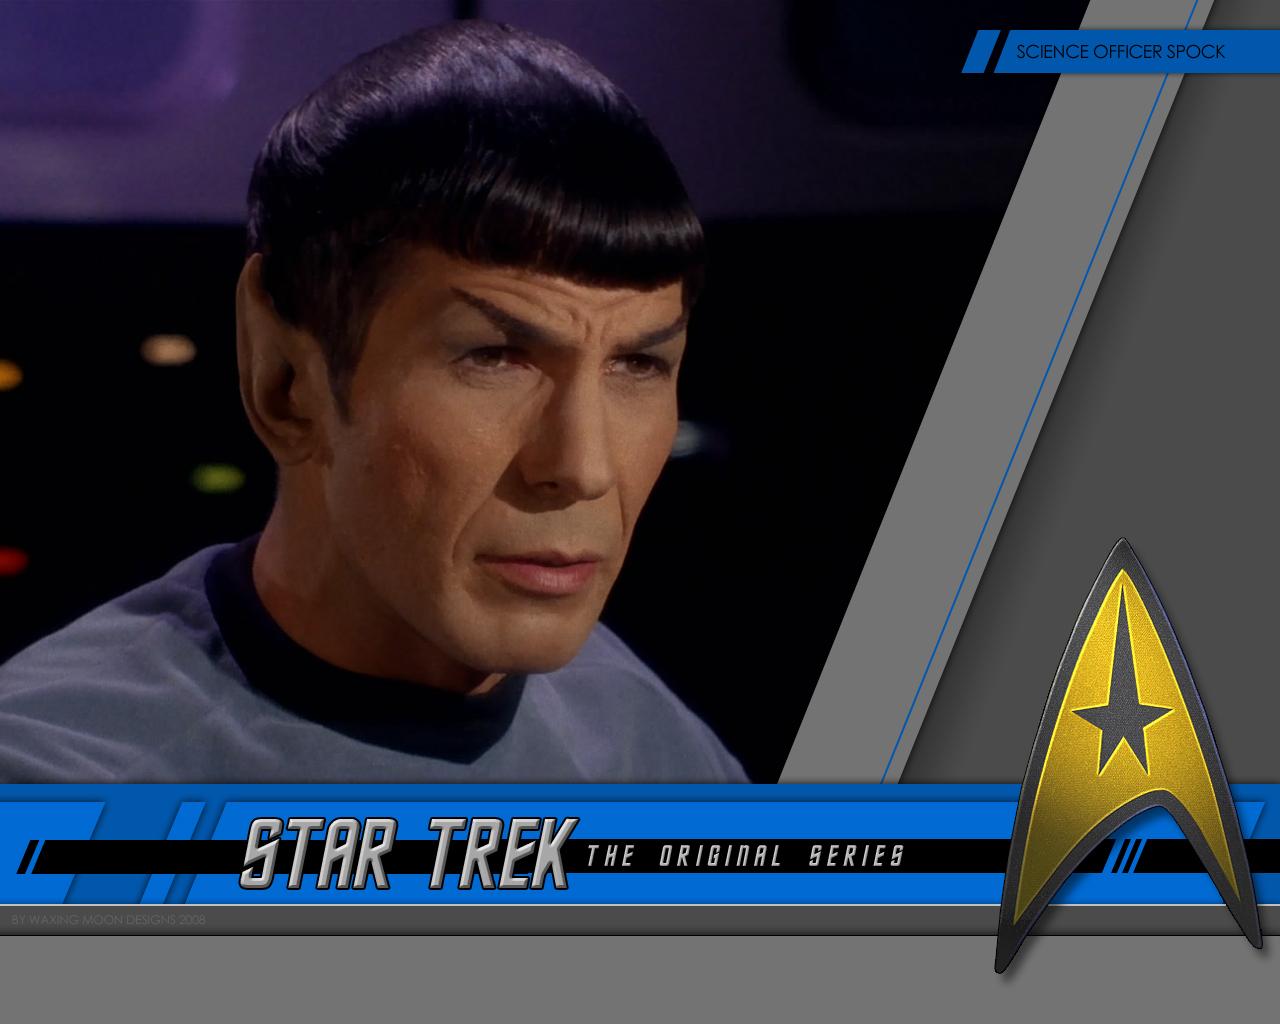 Star trek original series mr spock